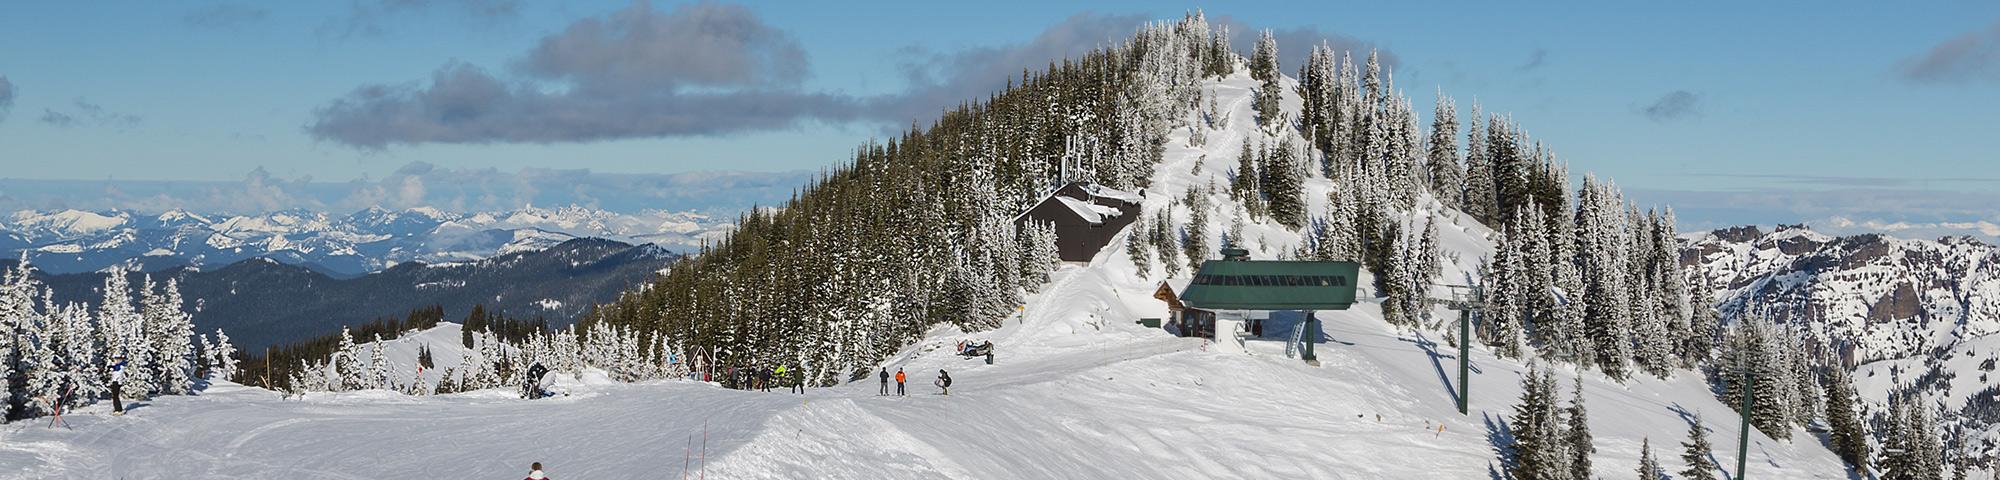 Crystal Mountain Resort Wa Open Amp Close Dates Updated